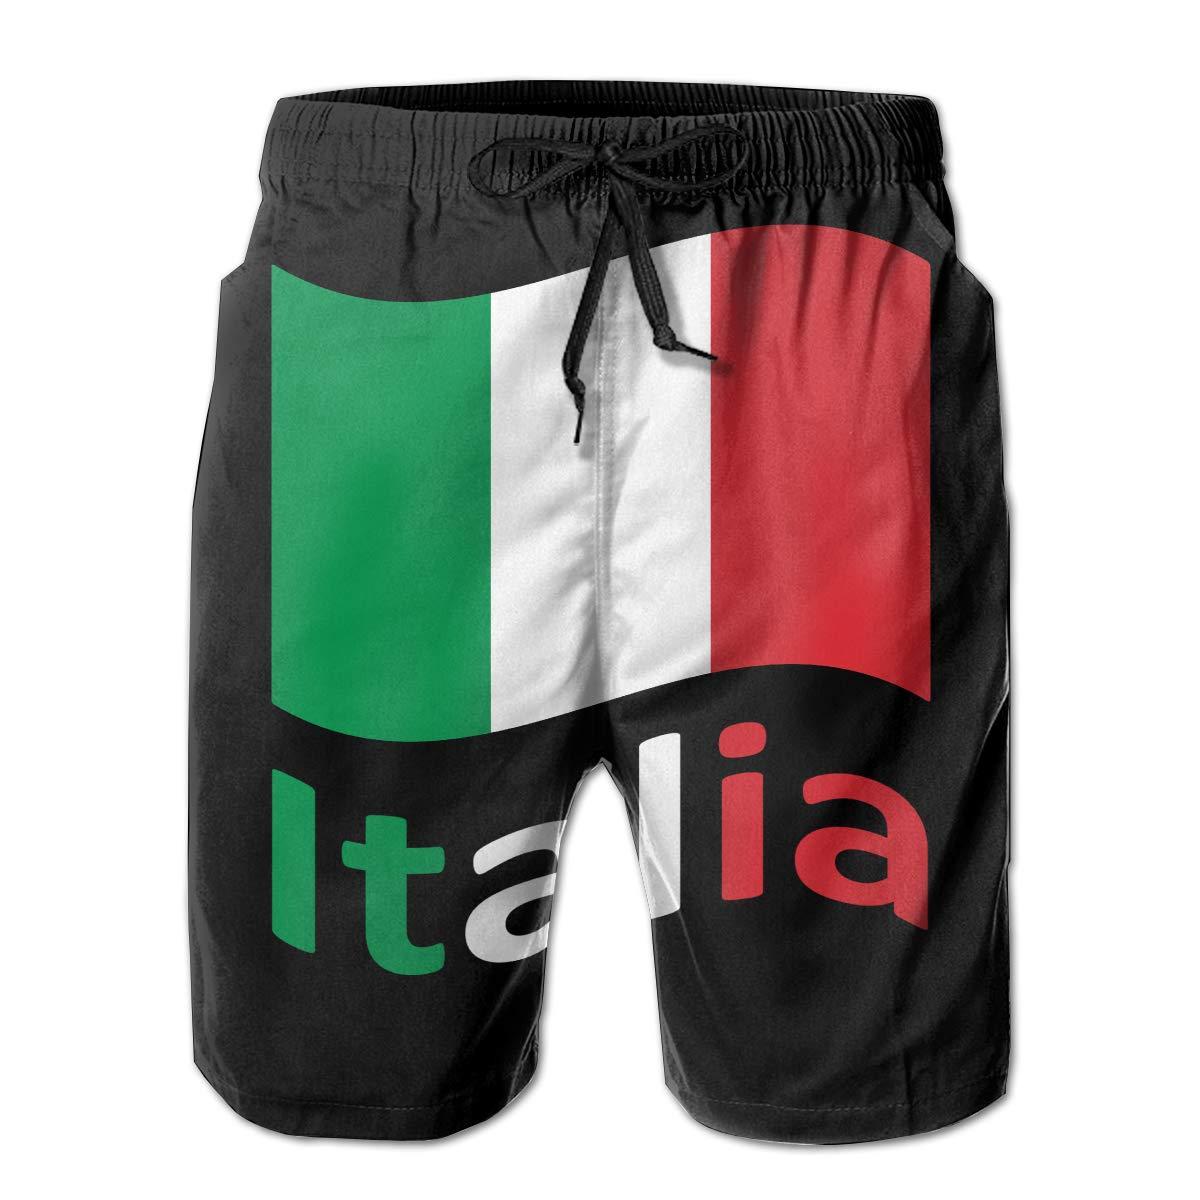 JF-X Italian Flag Mens Summer Beach Surf Board Shorts Quick Dry Swimming Trunks Casual Loose Sleep Short Pants